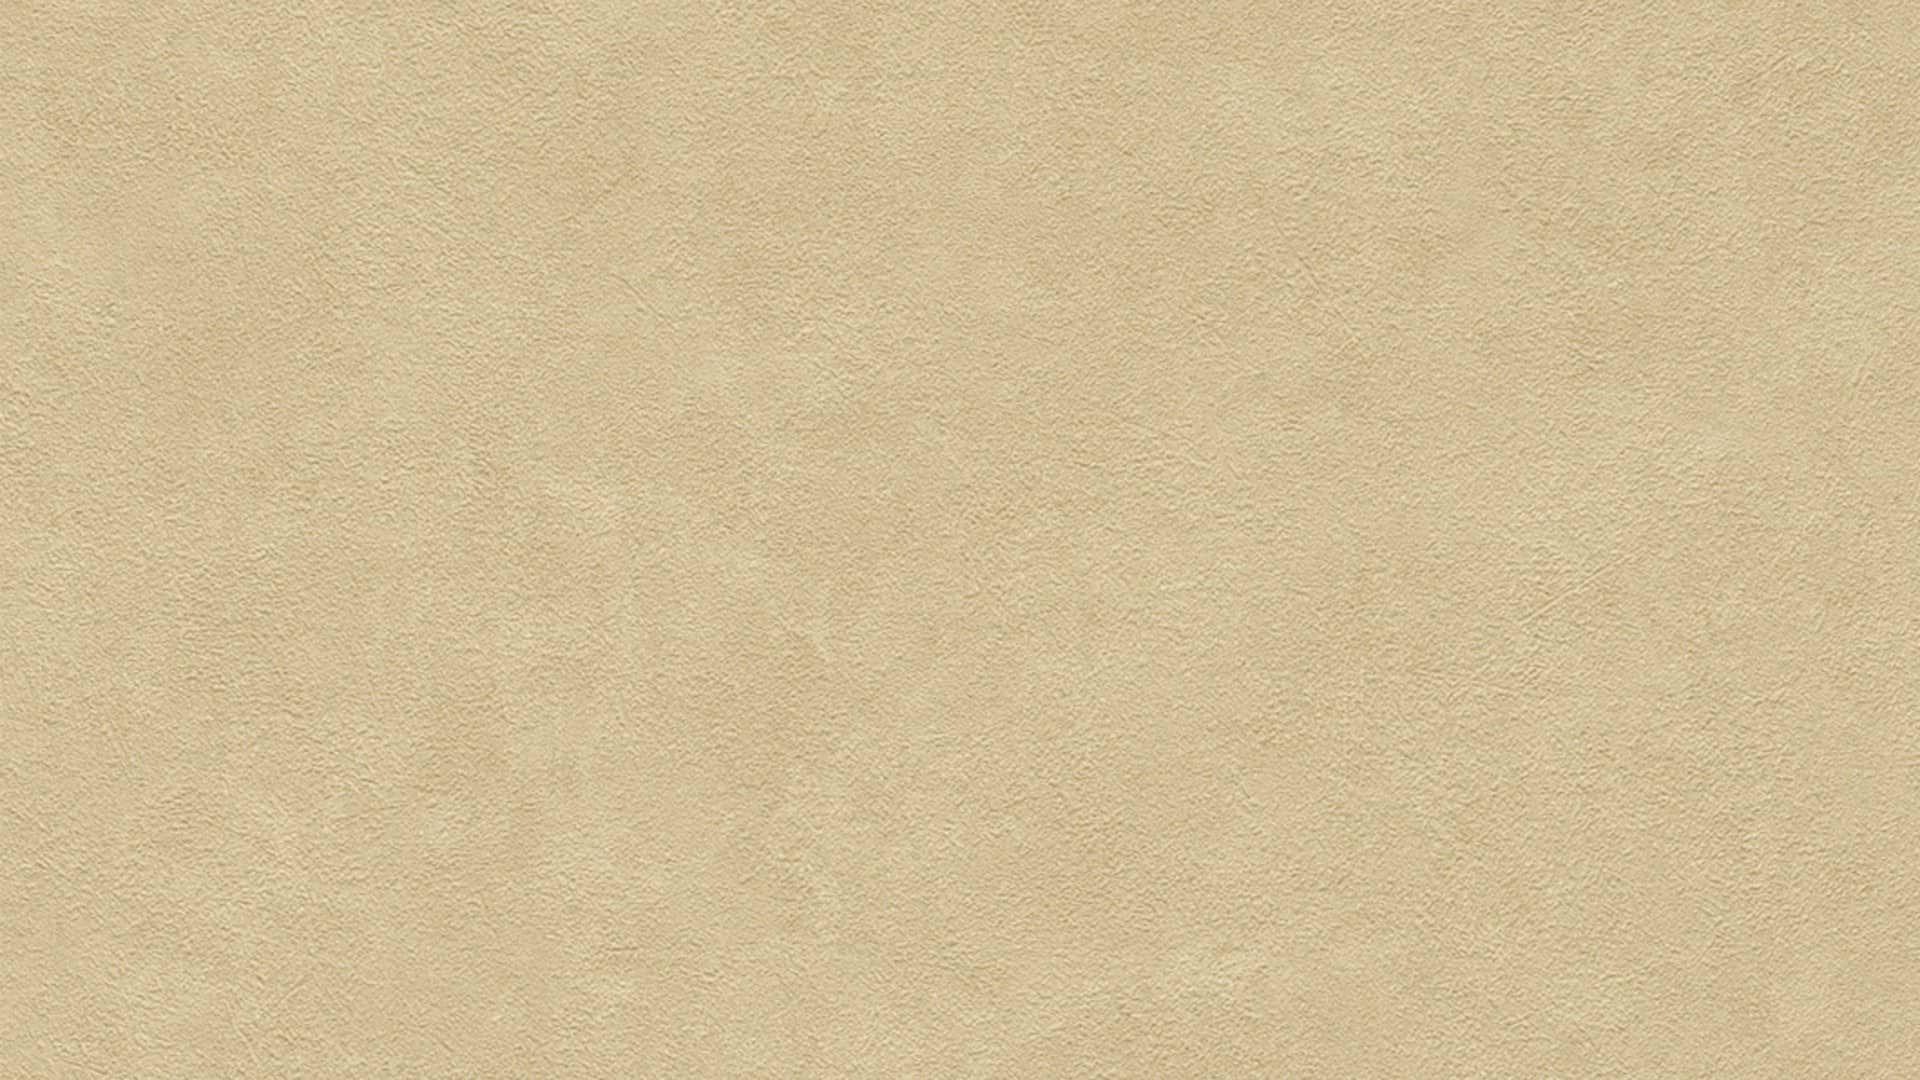 Website Background Texture image